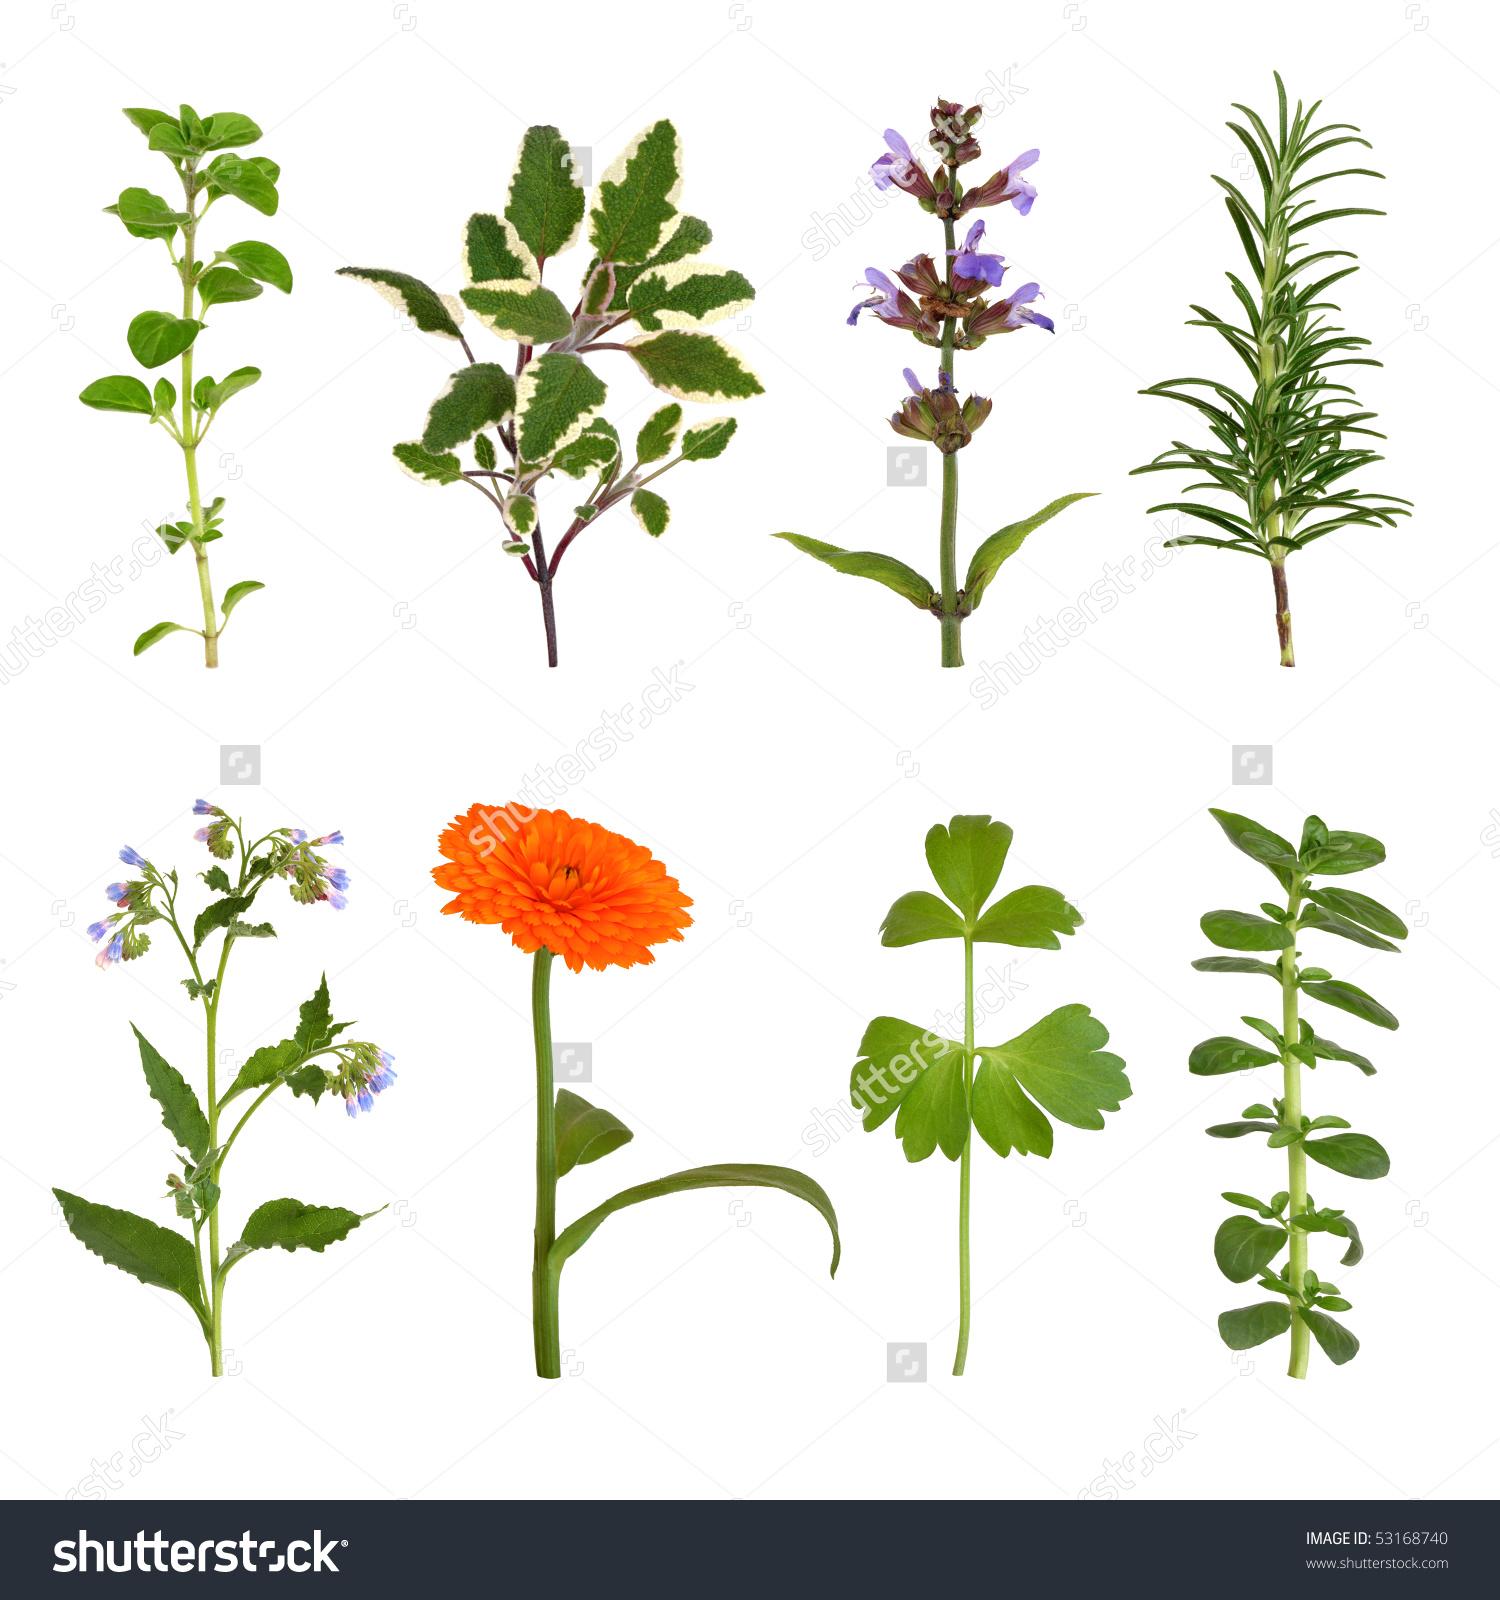 Herb Leaf Flower Selection Oregano Sage Stock Photo 53168740.